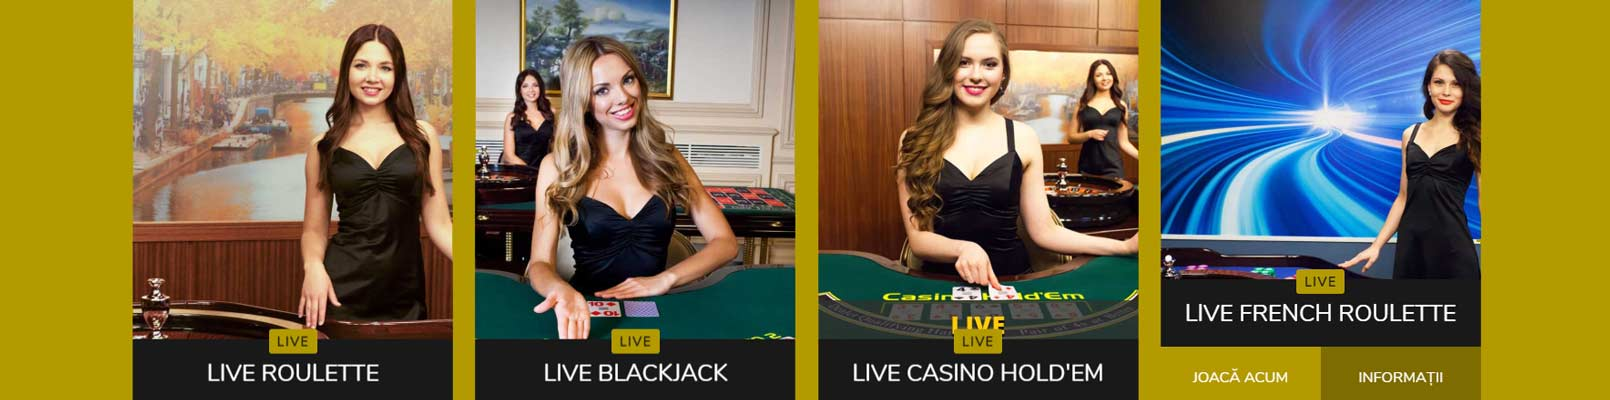 mese live casino efortuna